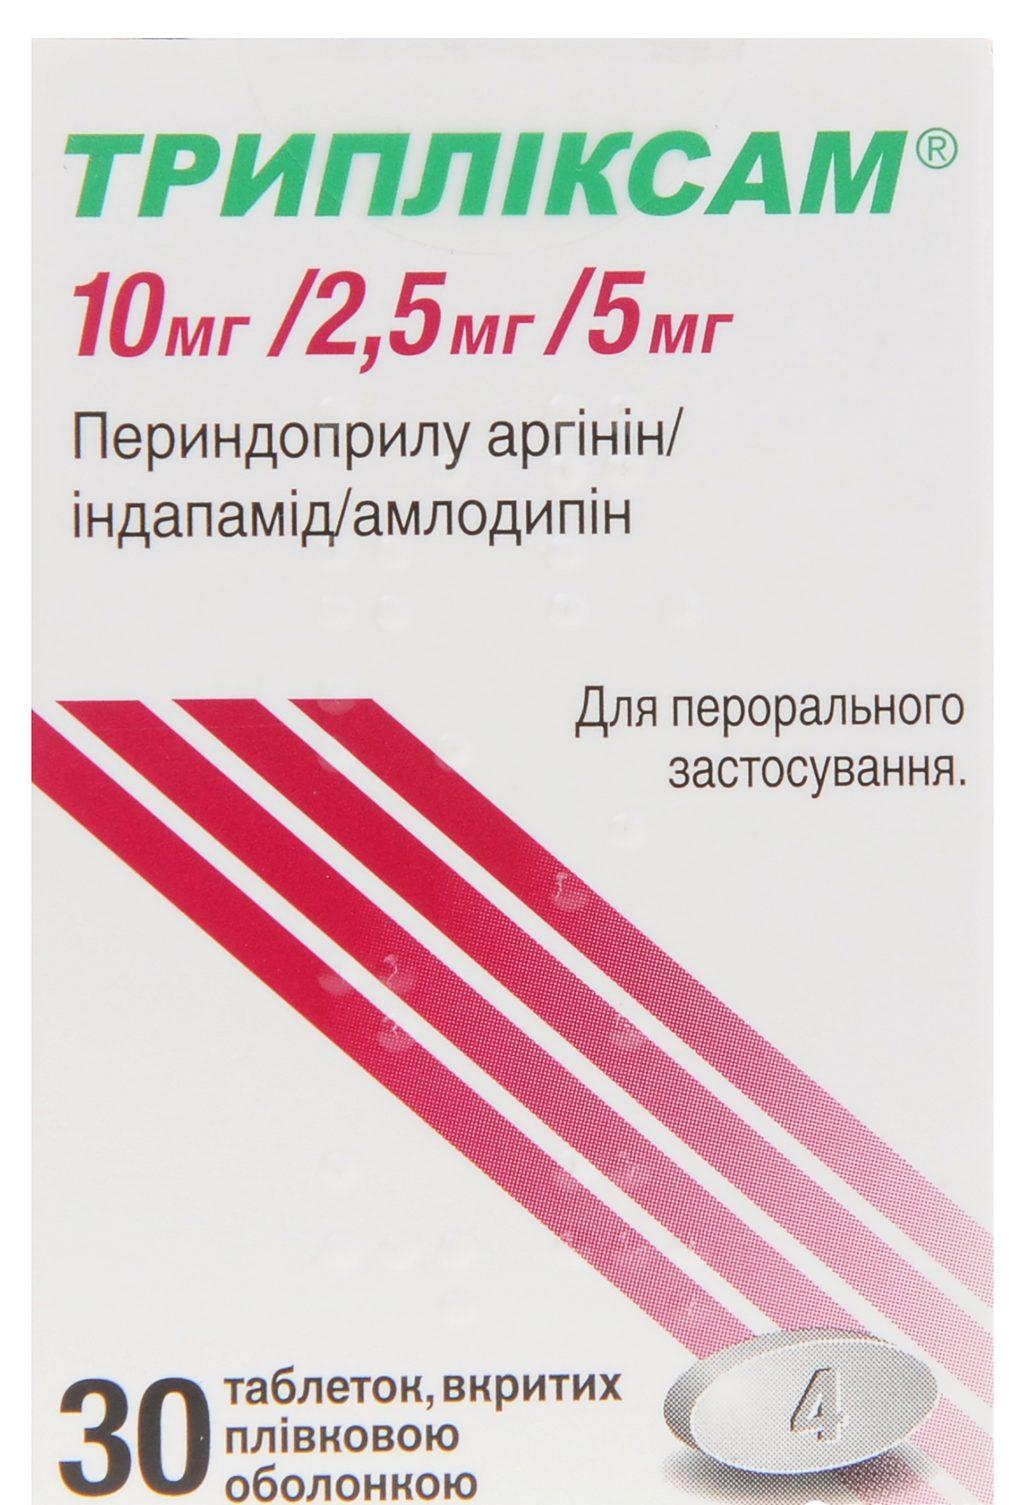 STREPFEN 8,75 mg Mйz- йs citromнzы szopogatу tabletta (16db)